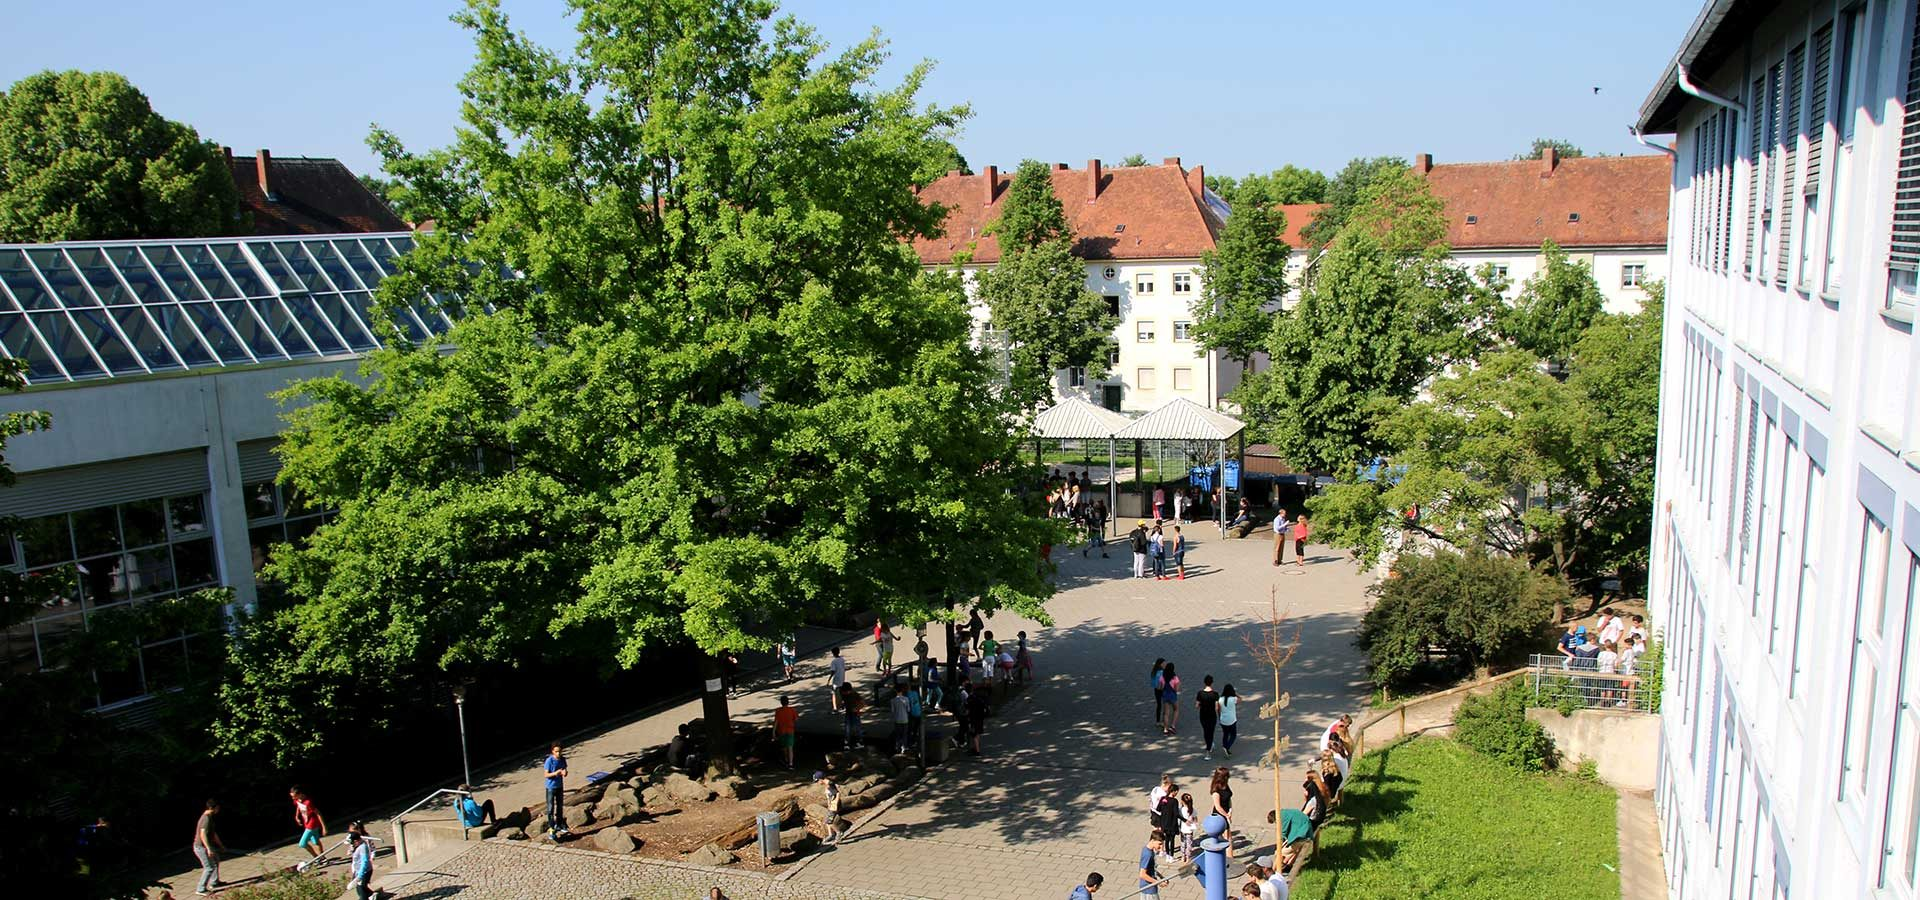 Grundschule Straubing